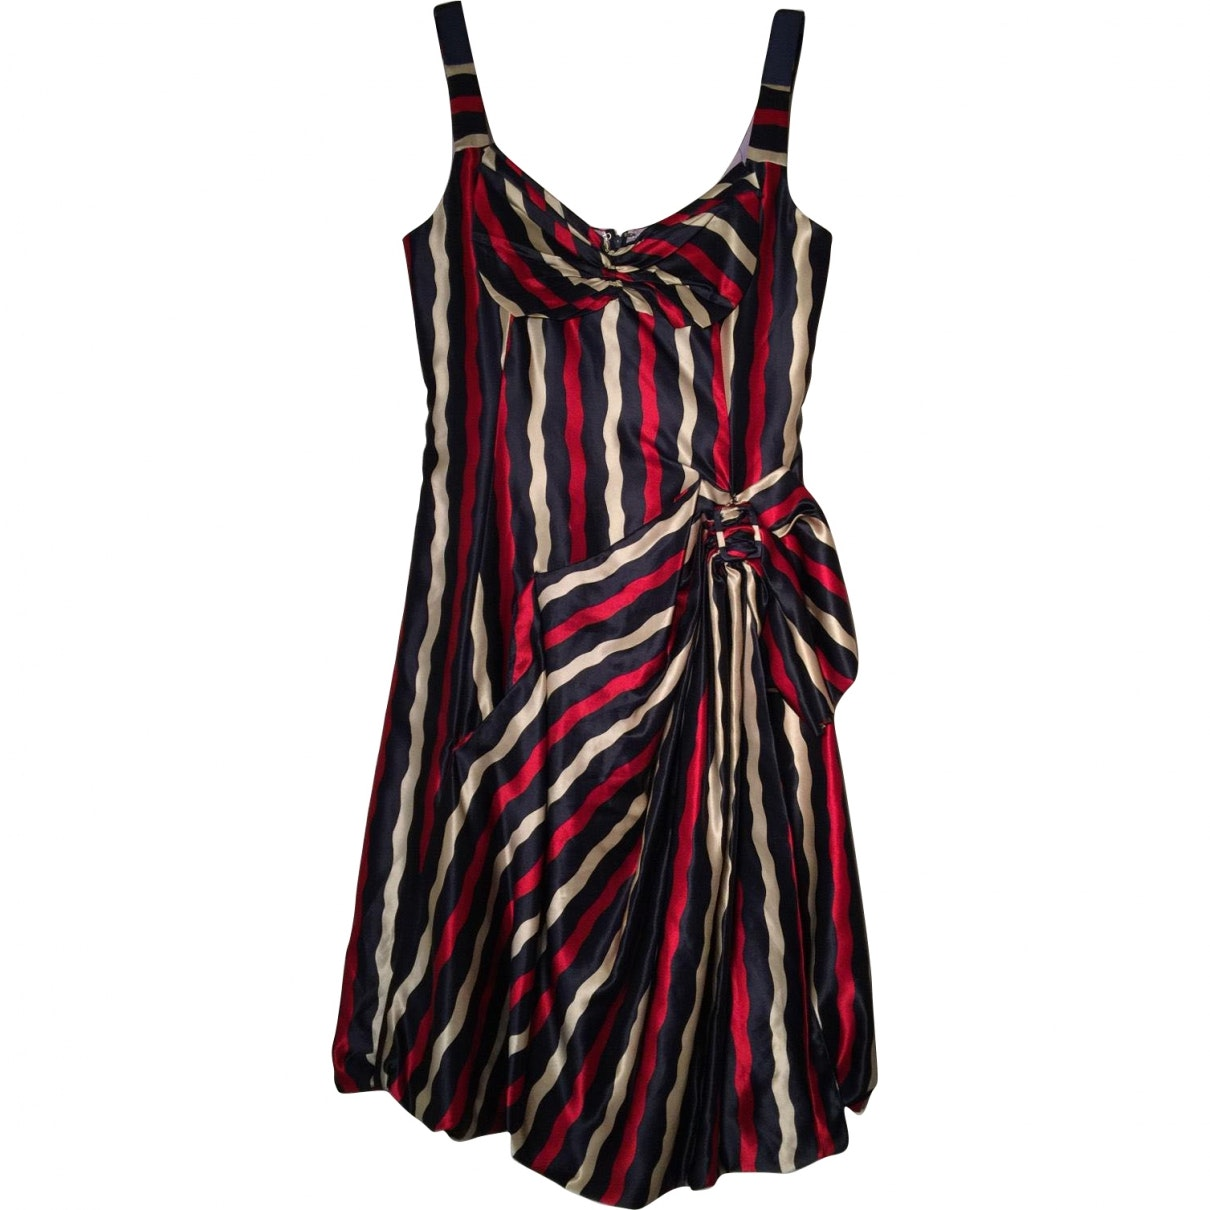 MARC JACOBS Multicolor Silk Mid-Length Dress; Size: 6 US; $180